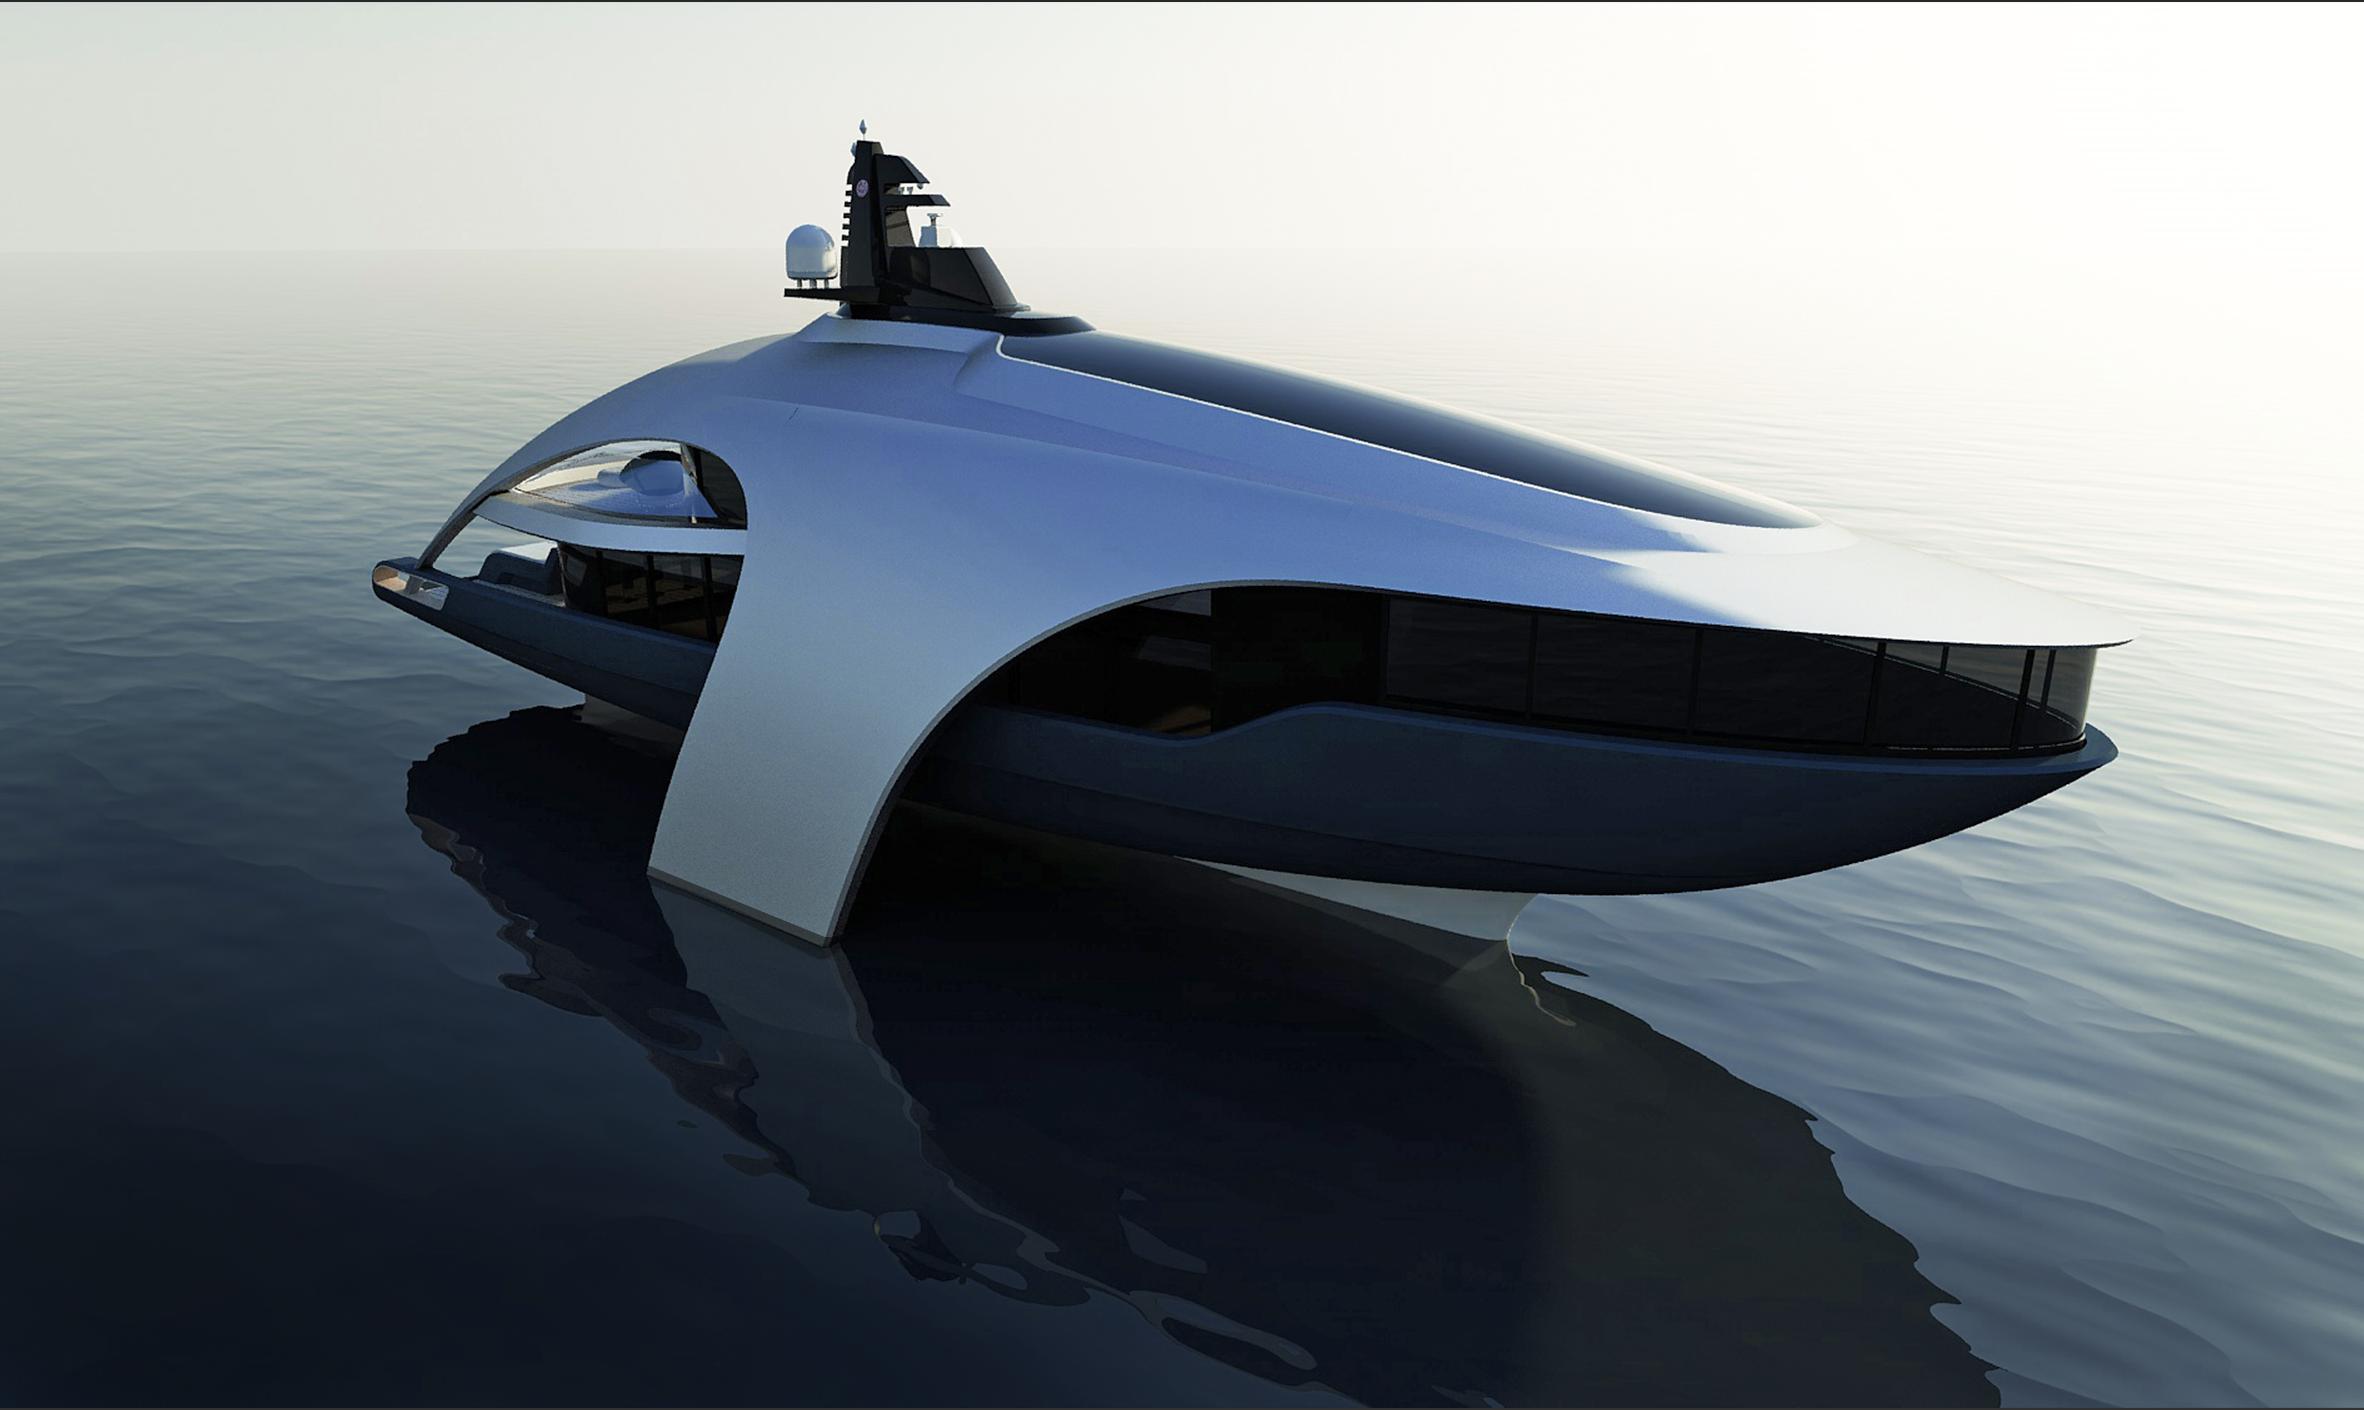 25m Swash Yacht, Hydro Swash Design by Focus Yacht Design